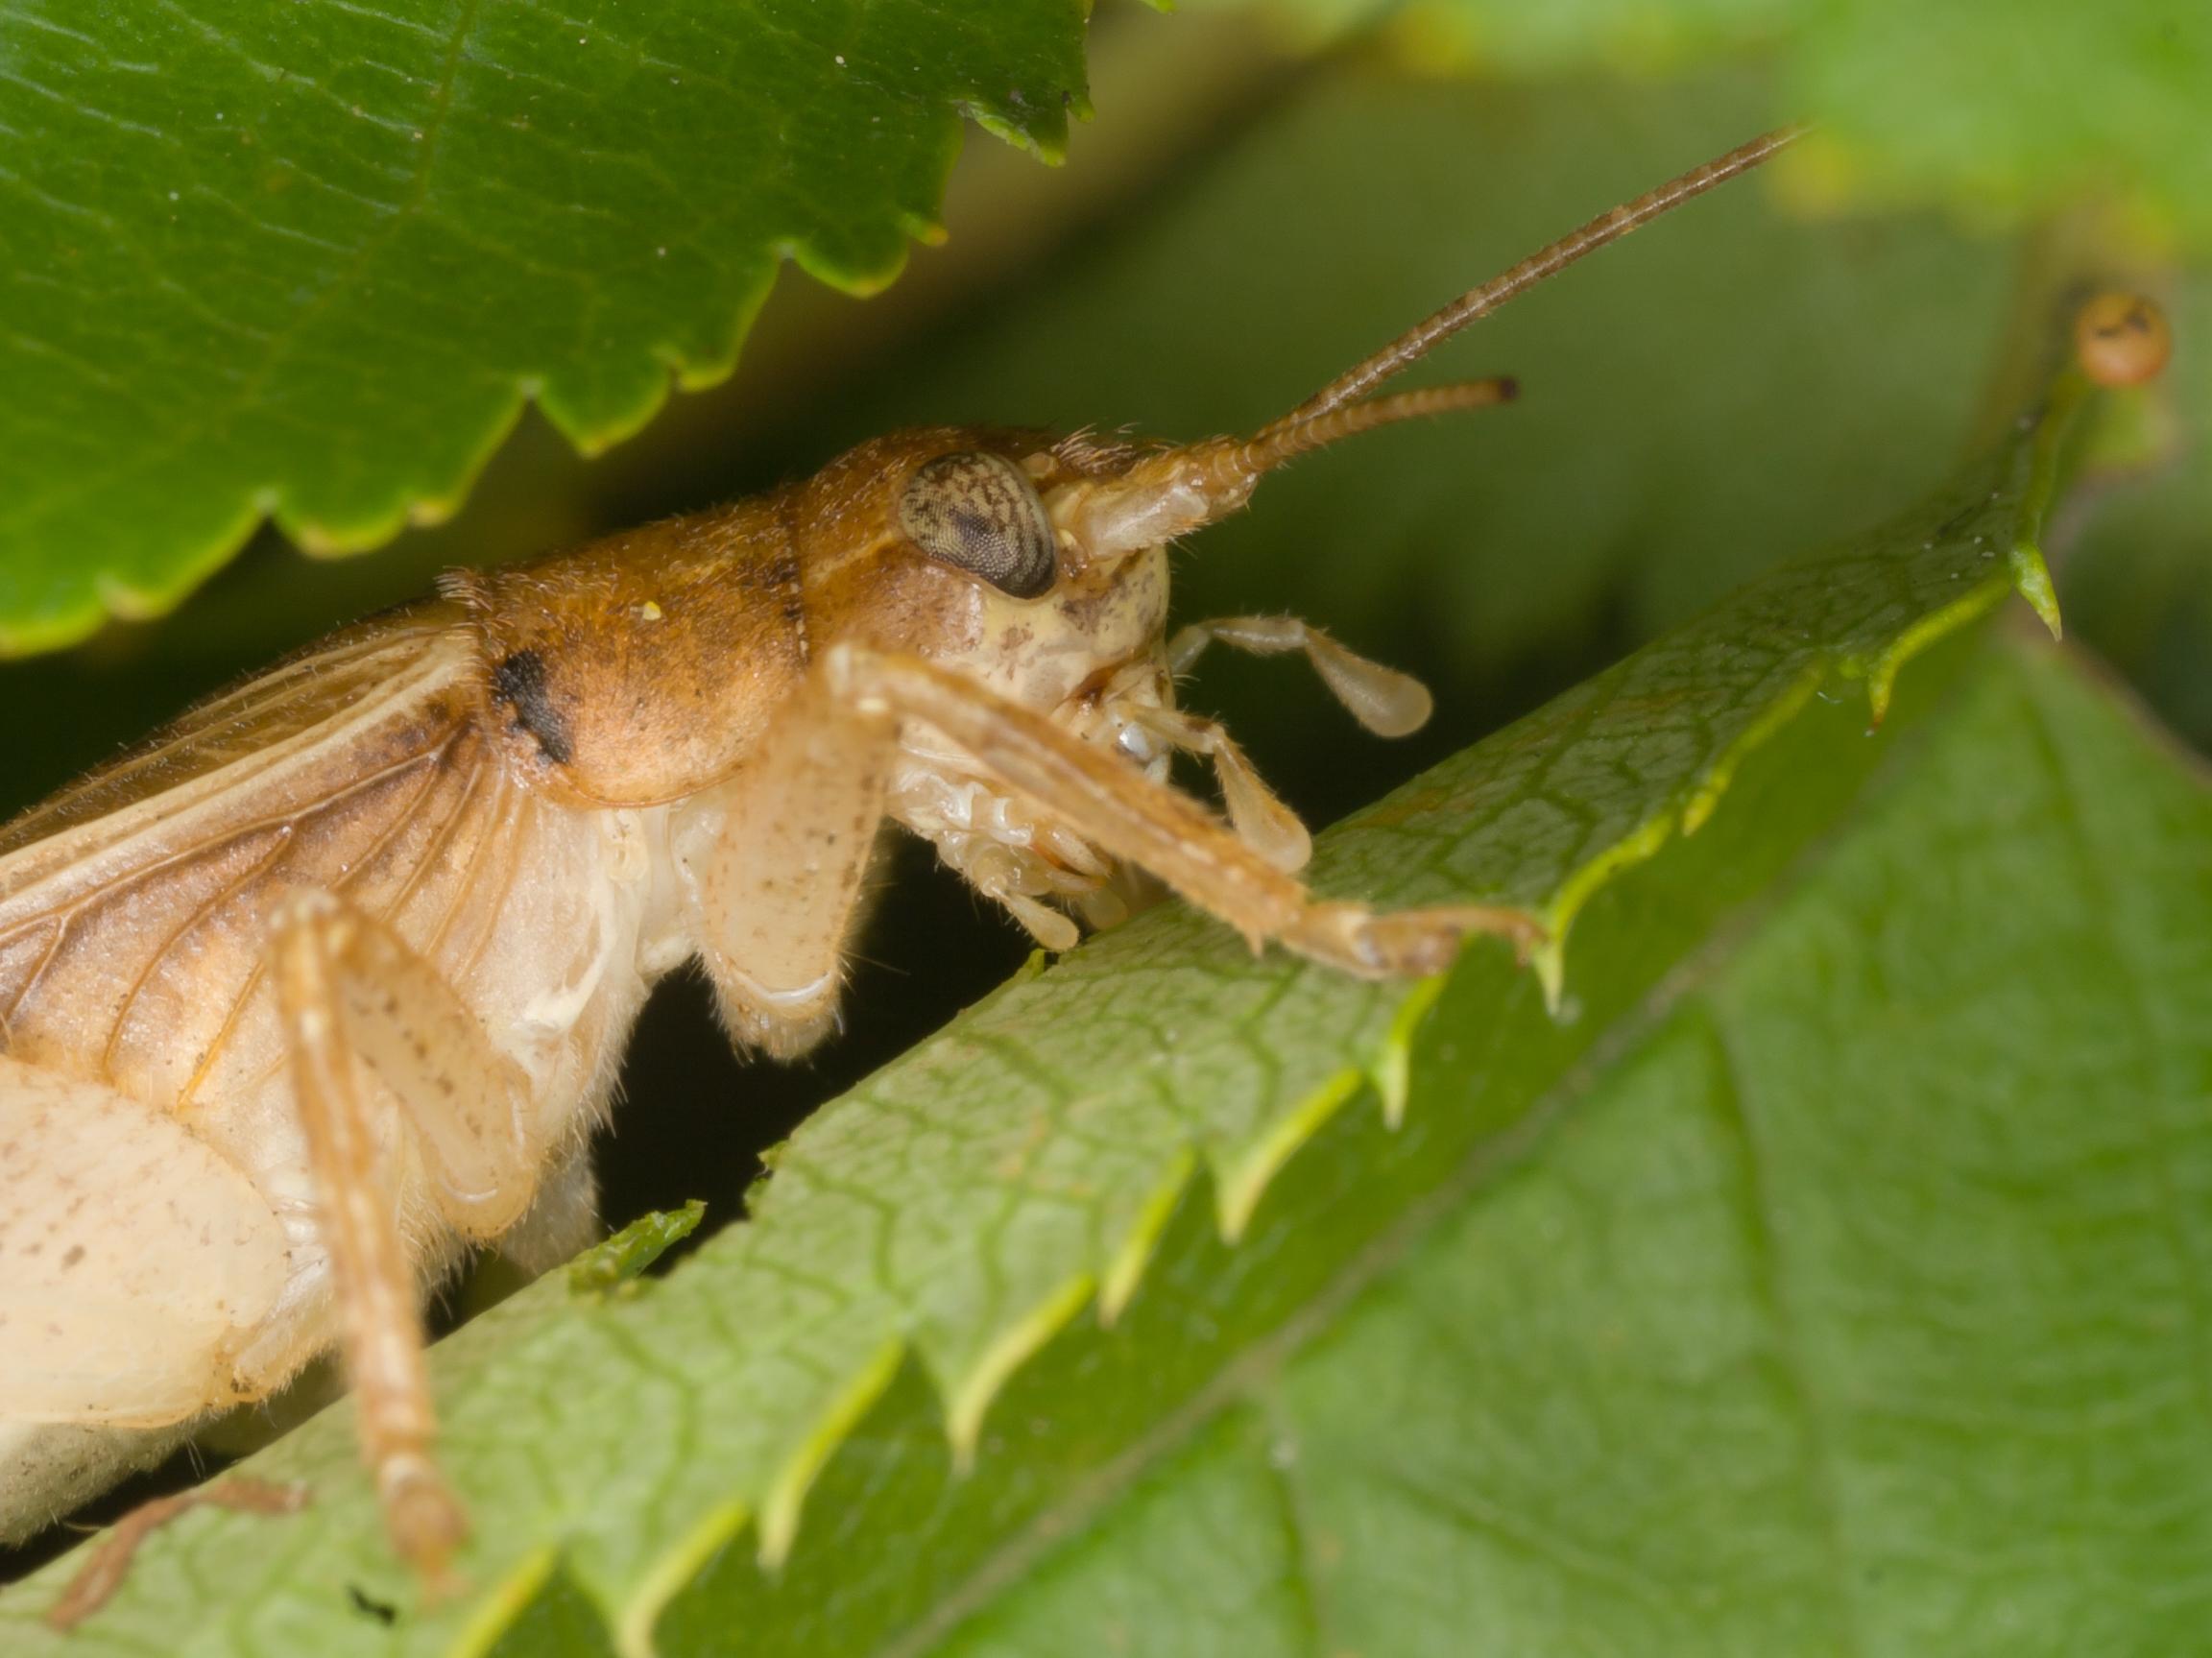 Cricket - Order: Orthoptera, Family: Gryllidae